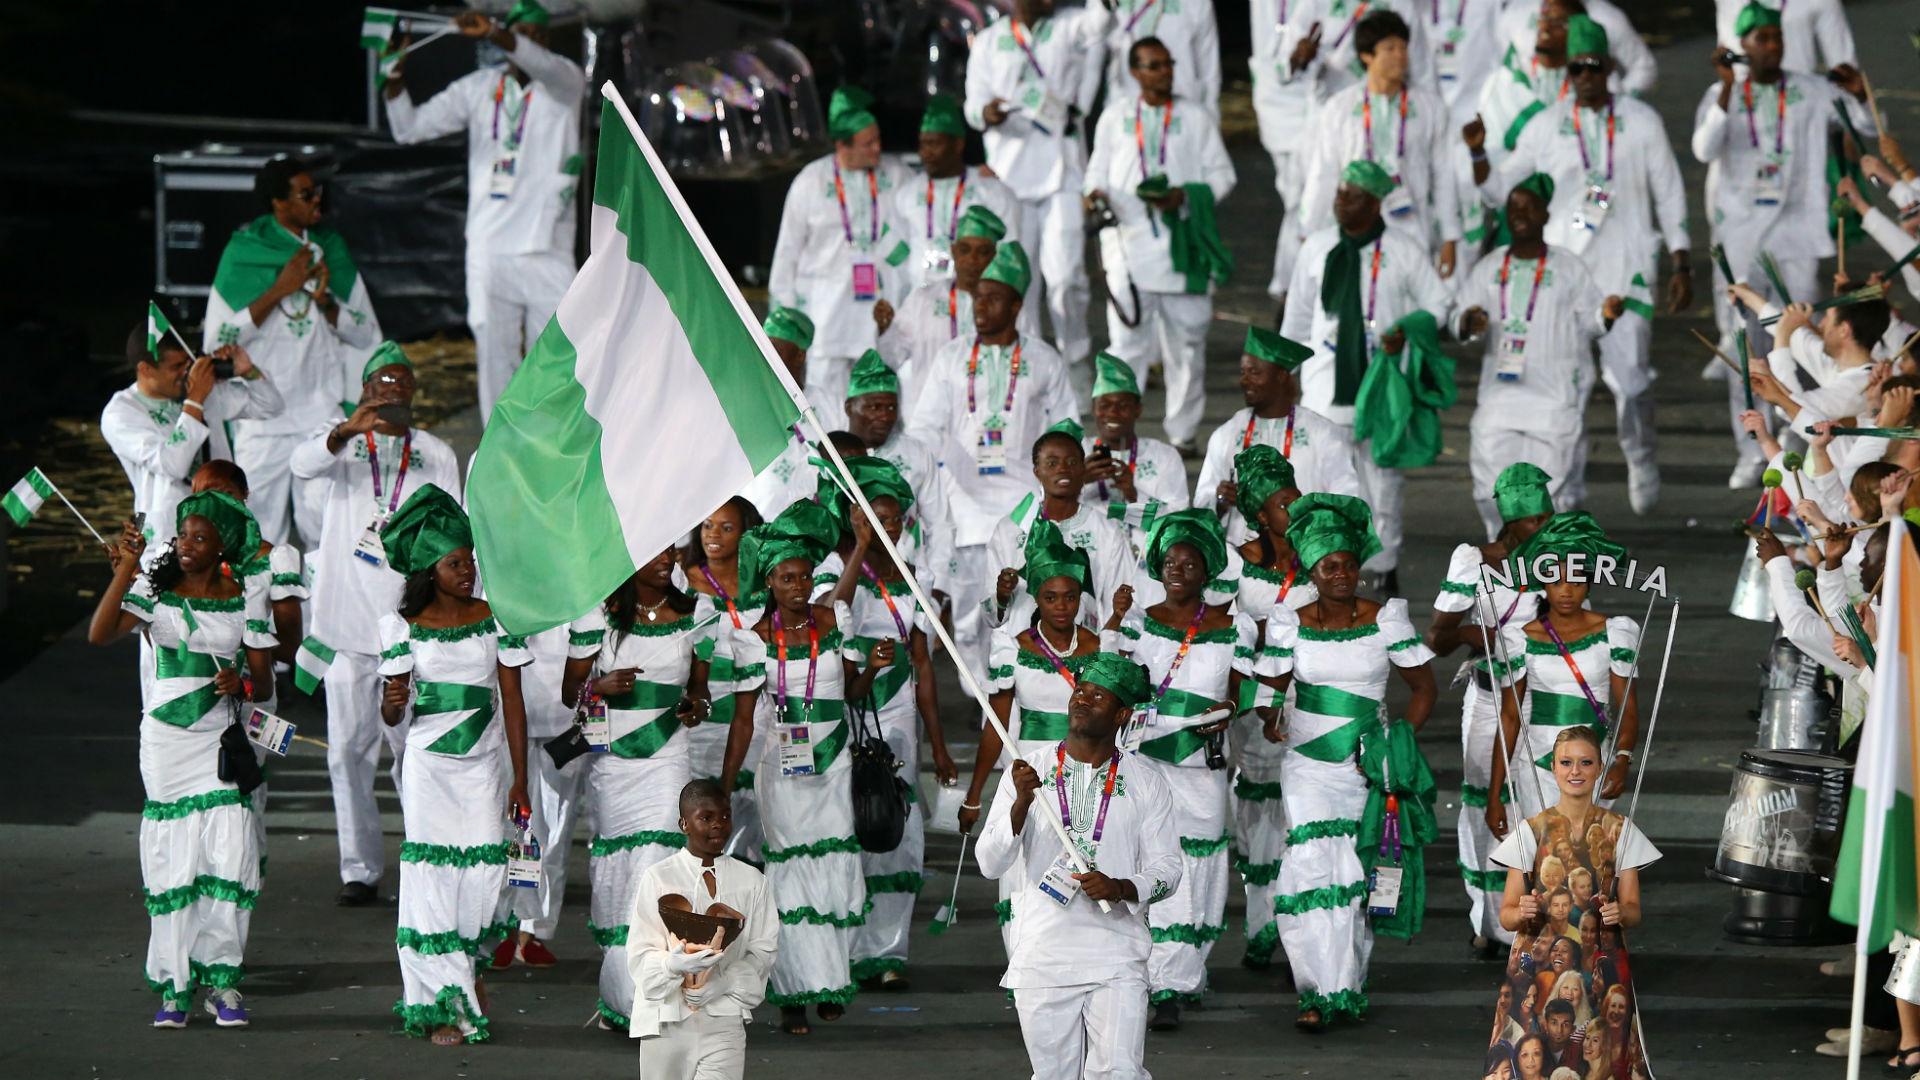 Coronavirus: Nigeria postpones all football activities until April 15